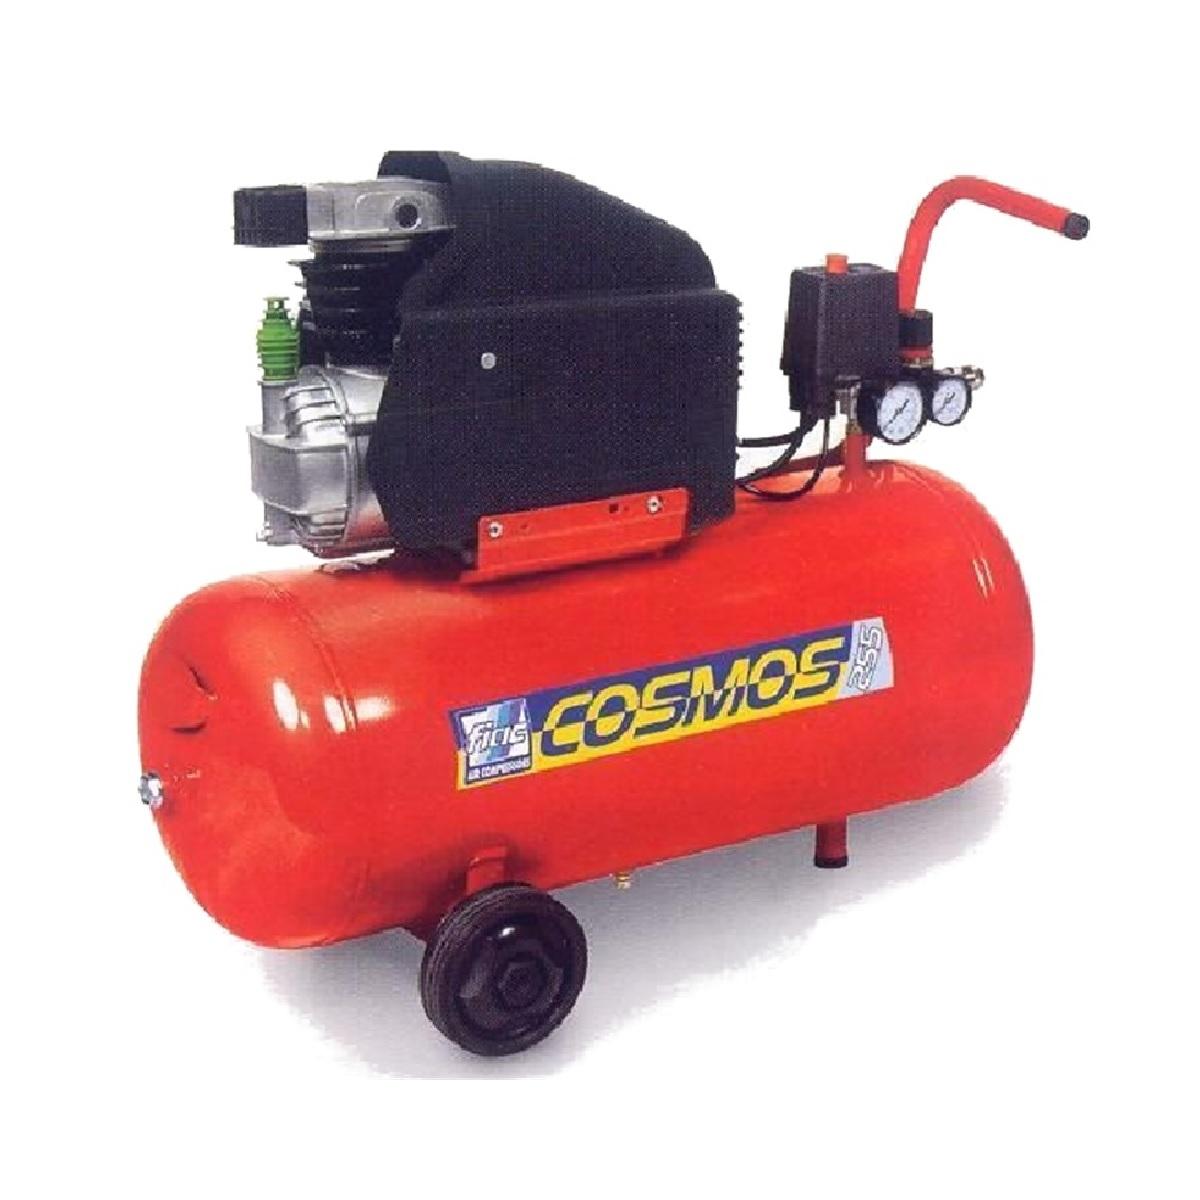 Fiac AB 24/145, Air Compressor 2.0 HP 24L (Made In Italy)